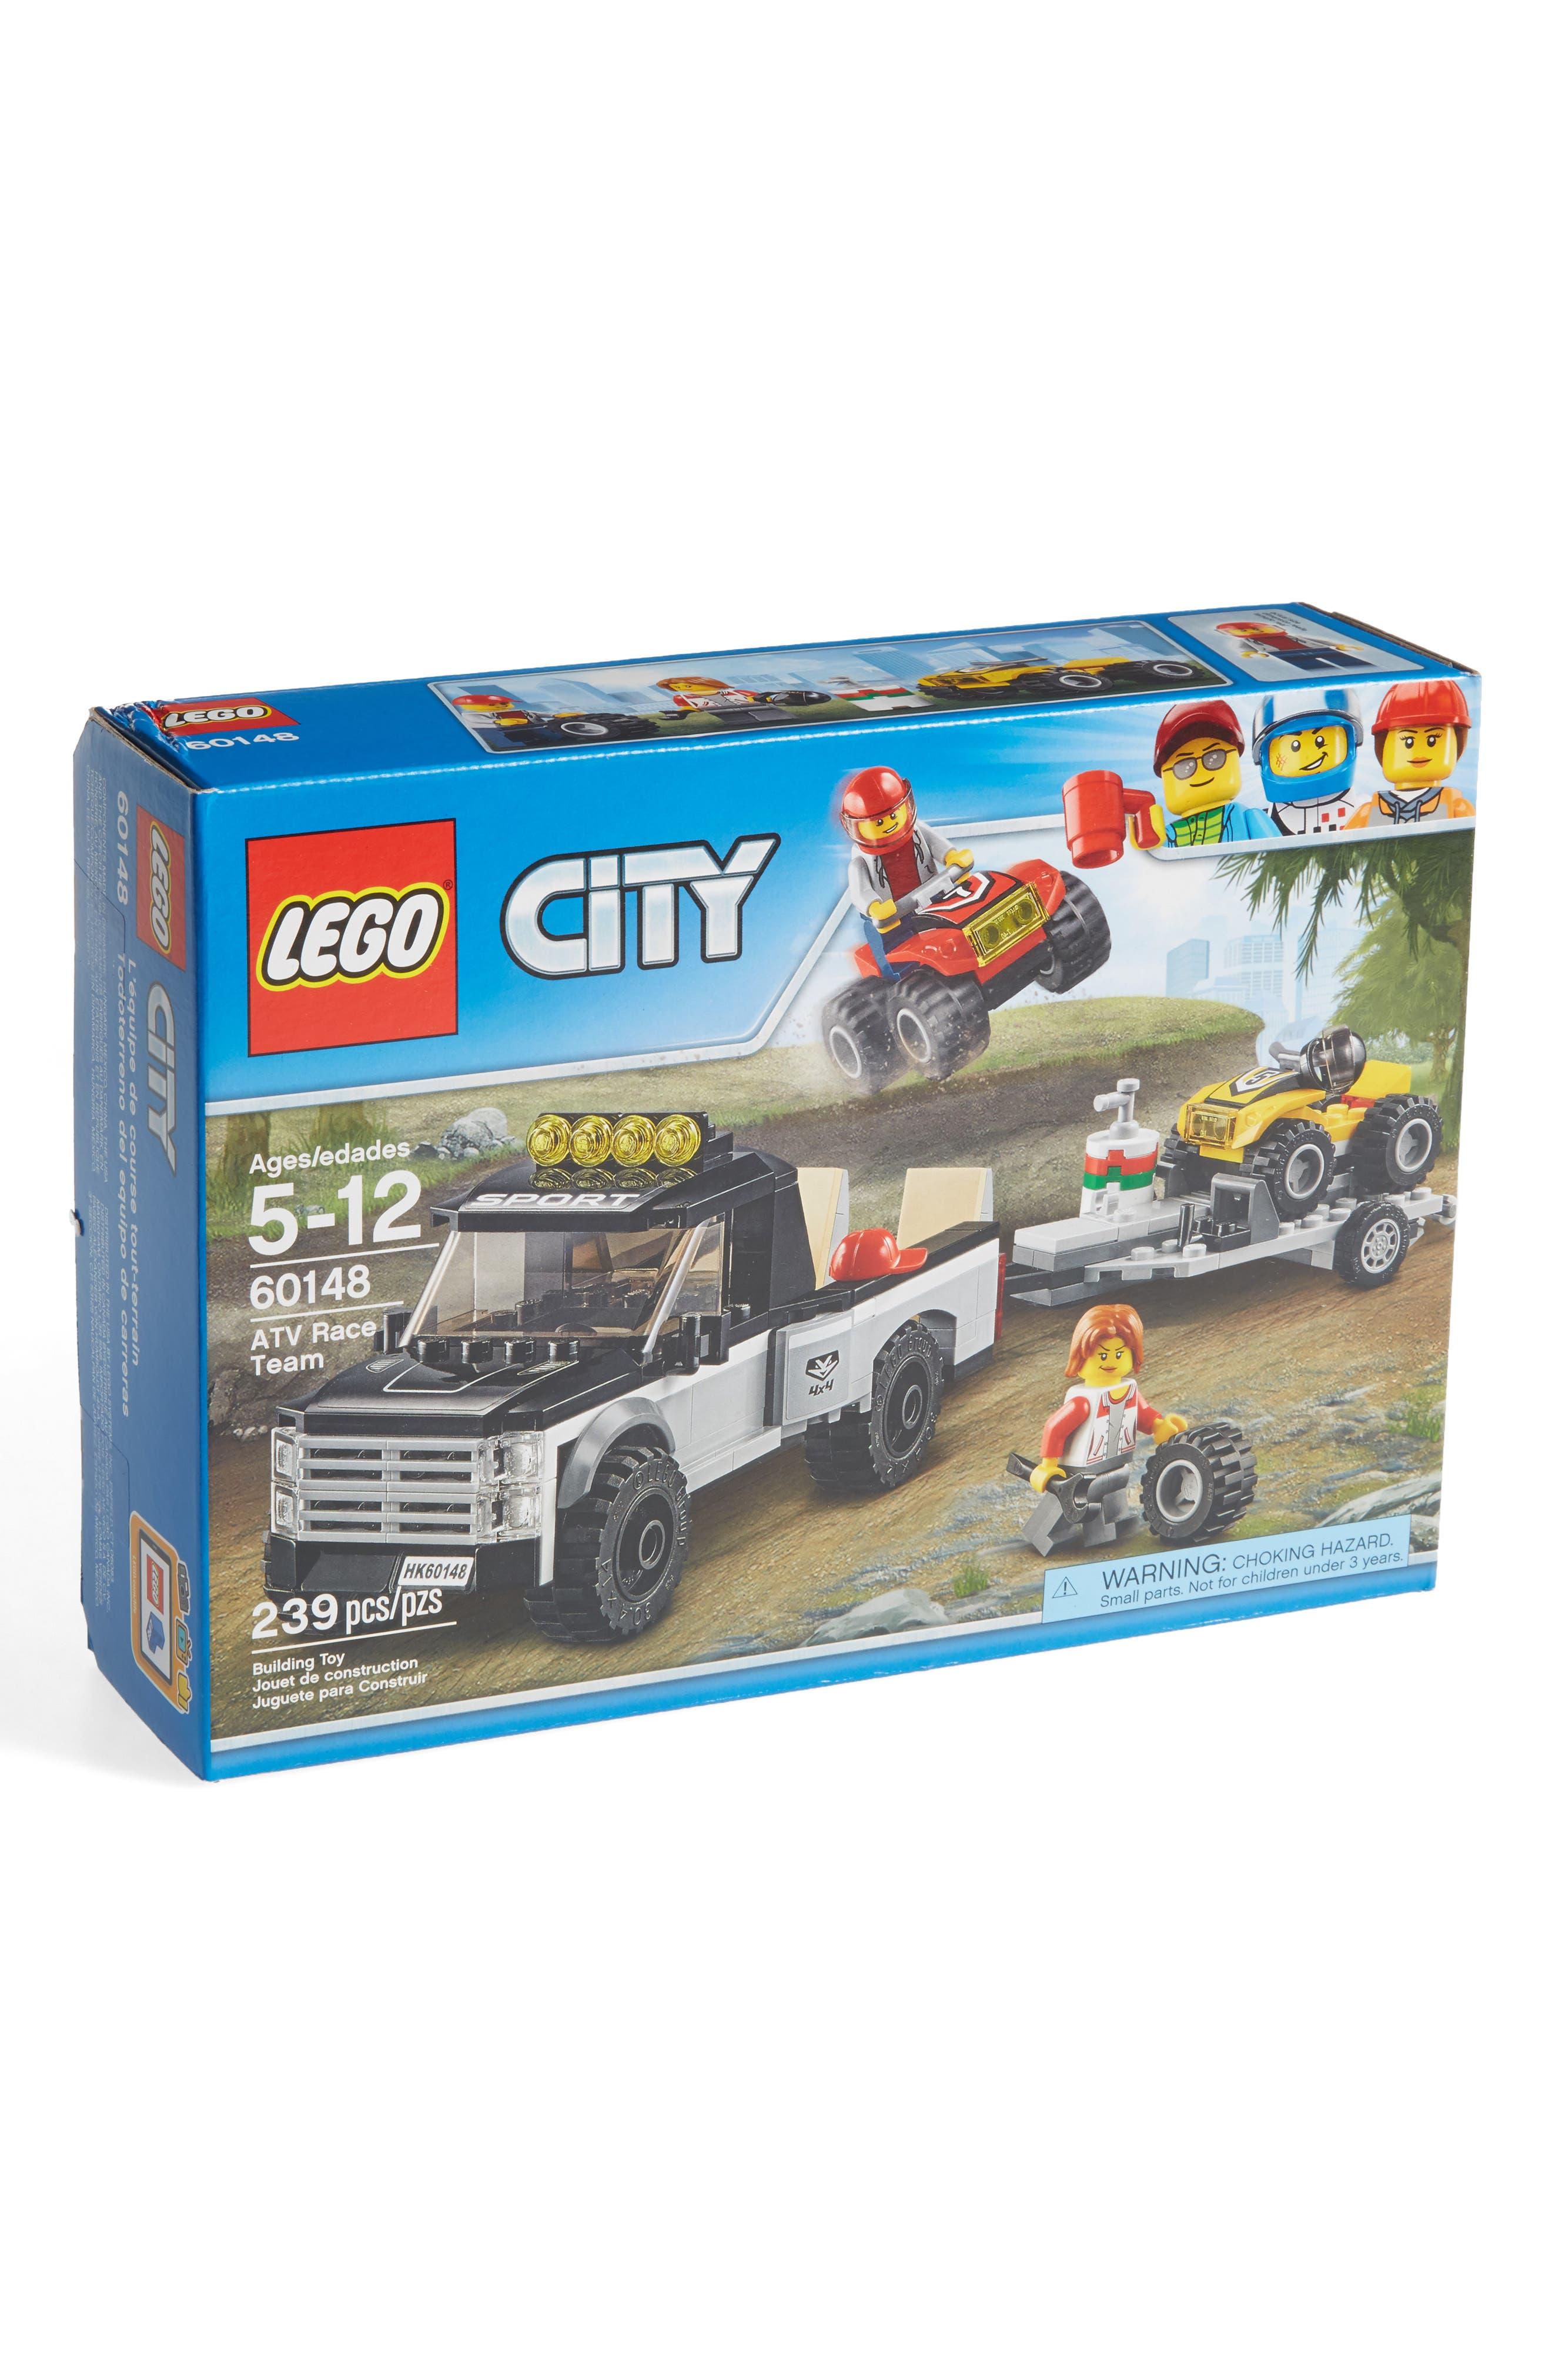 Main Image - LEGO® City ATV Race Team - 60148